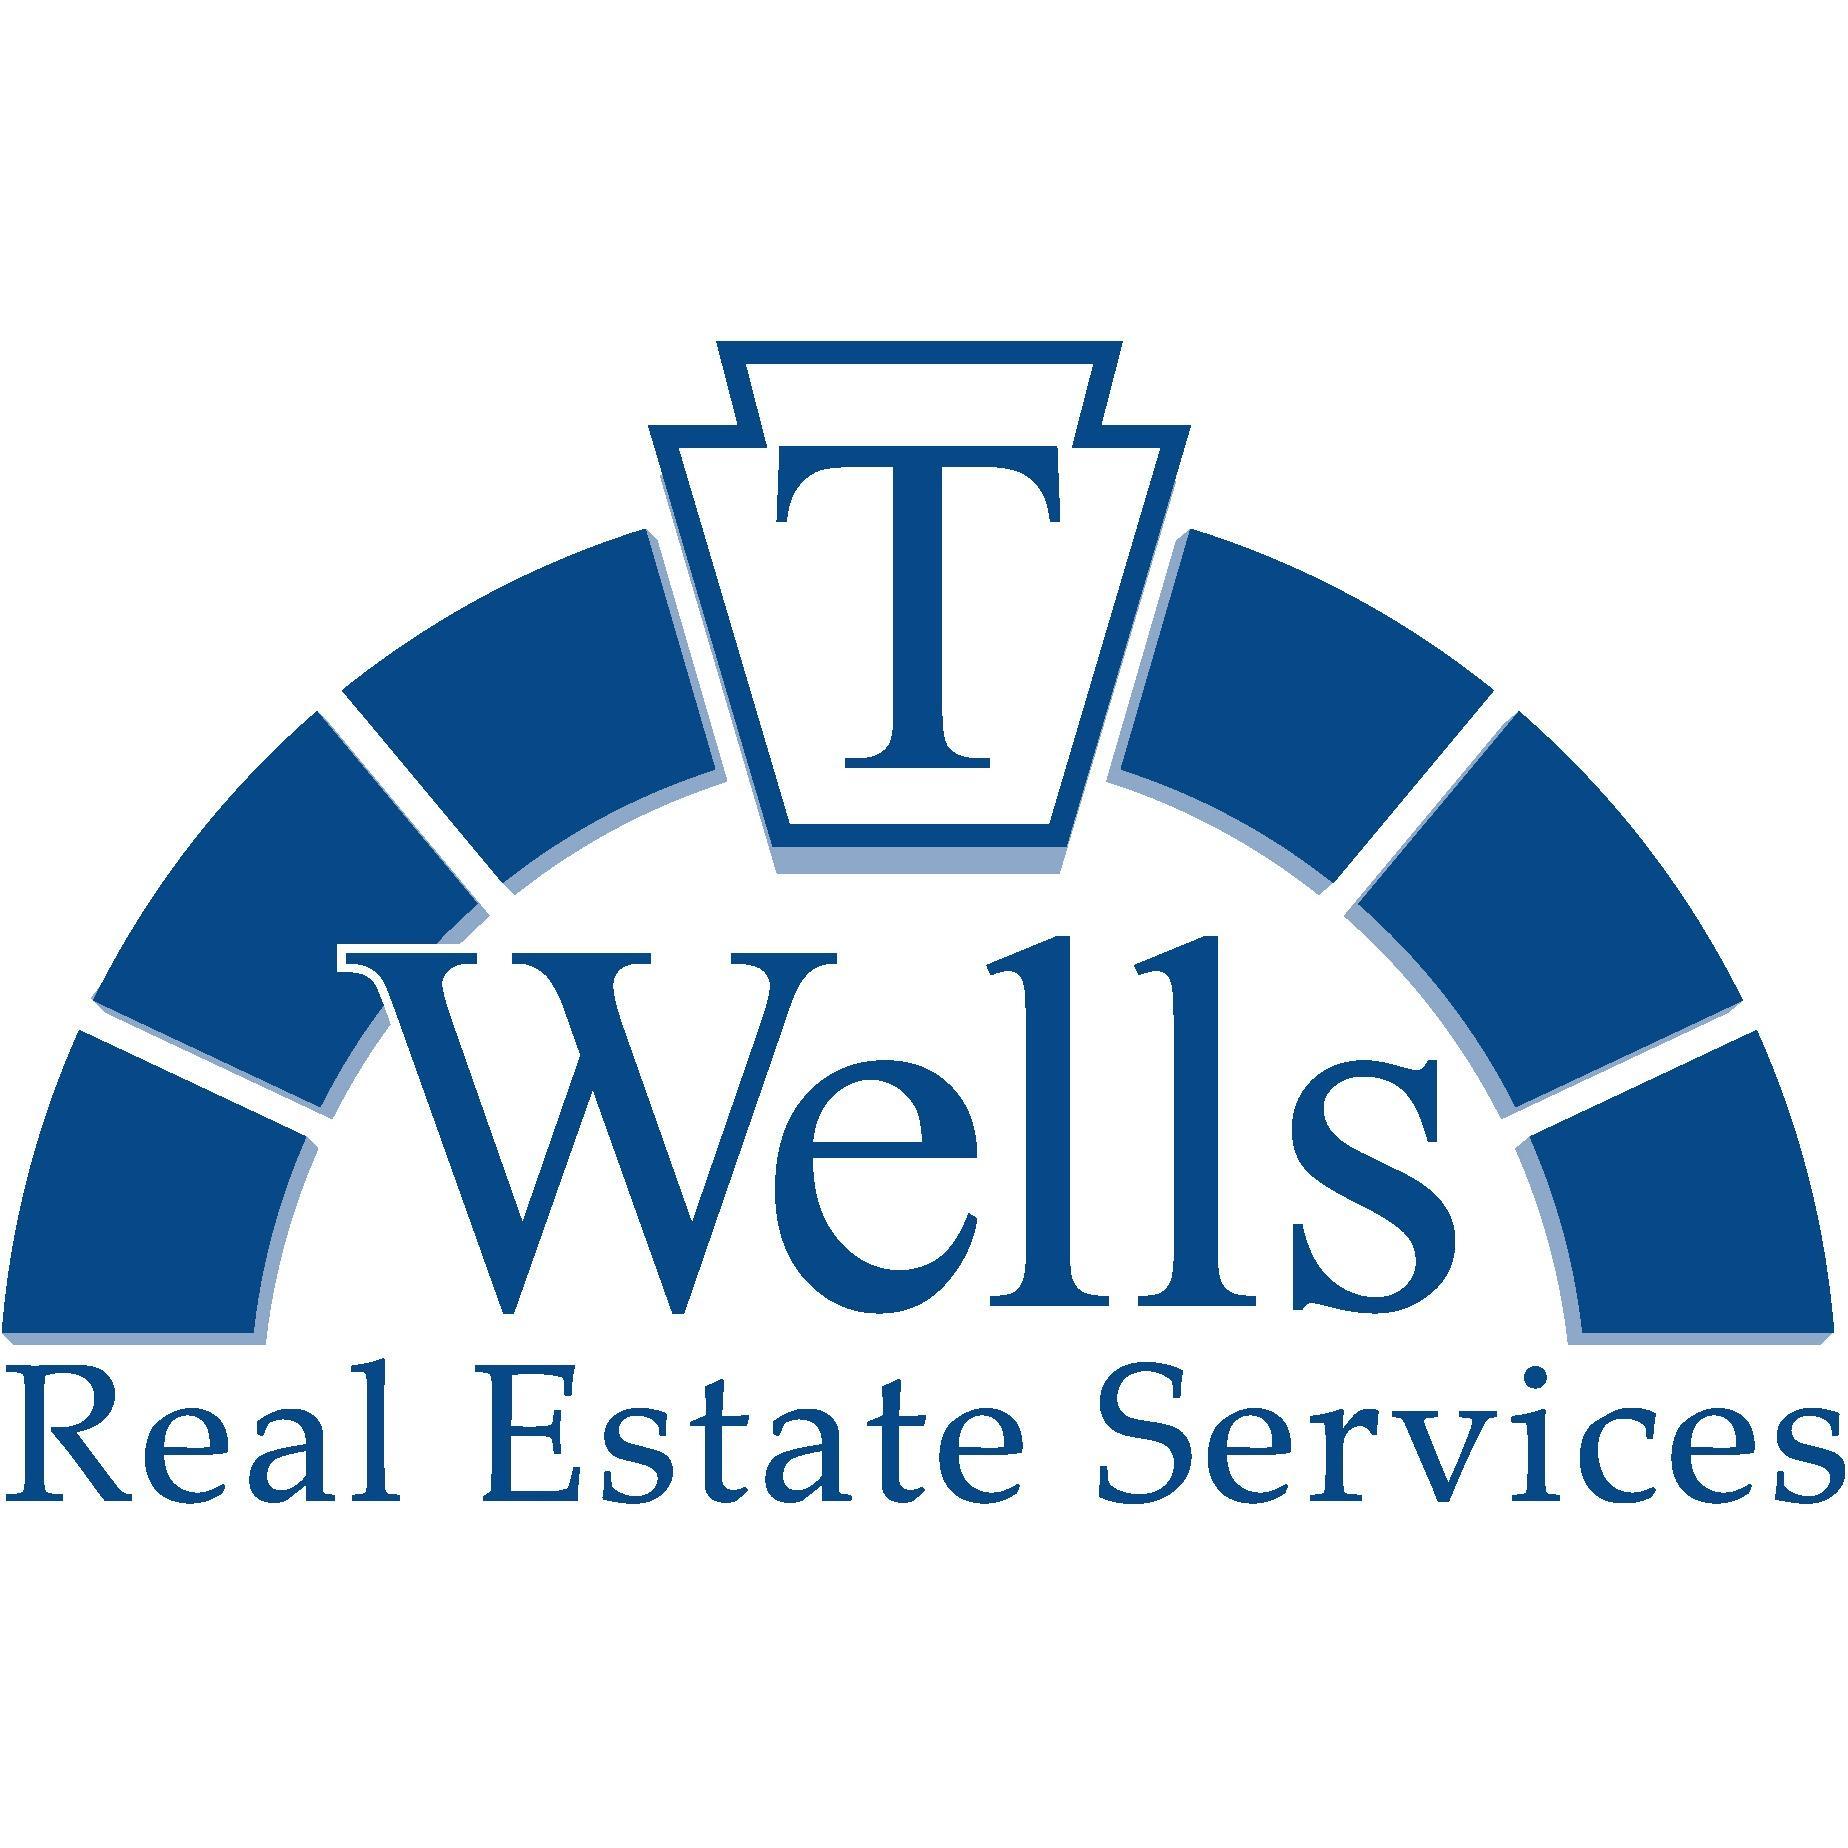 T.Wells Real Estate Services, LLC